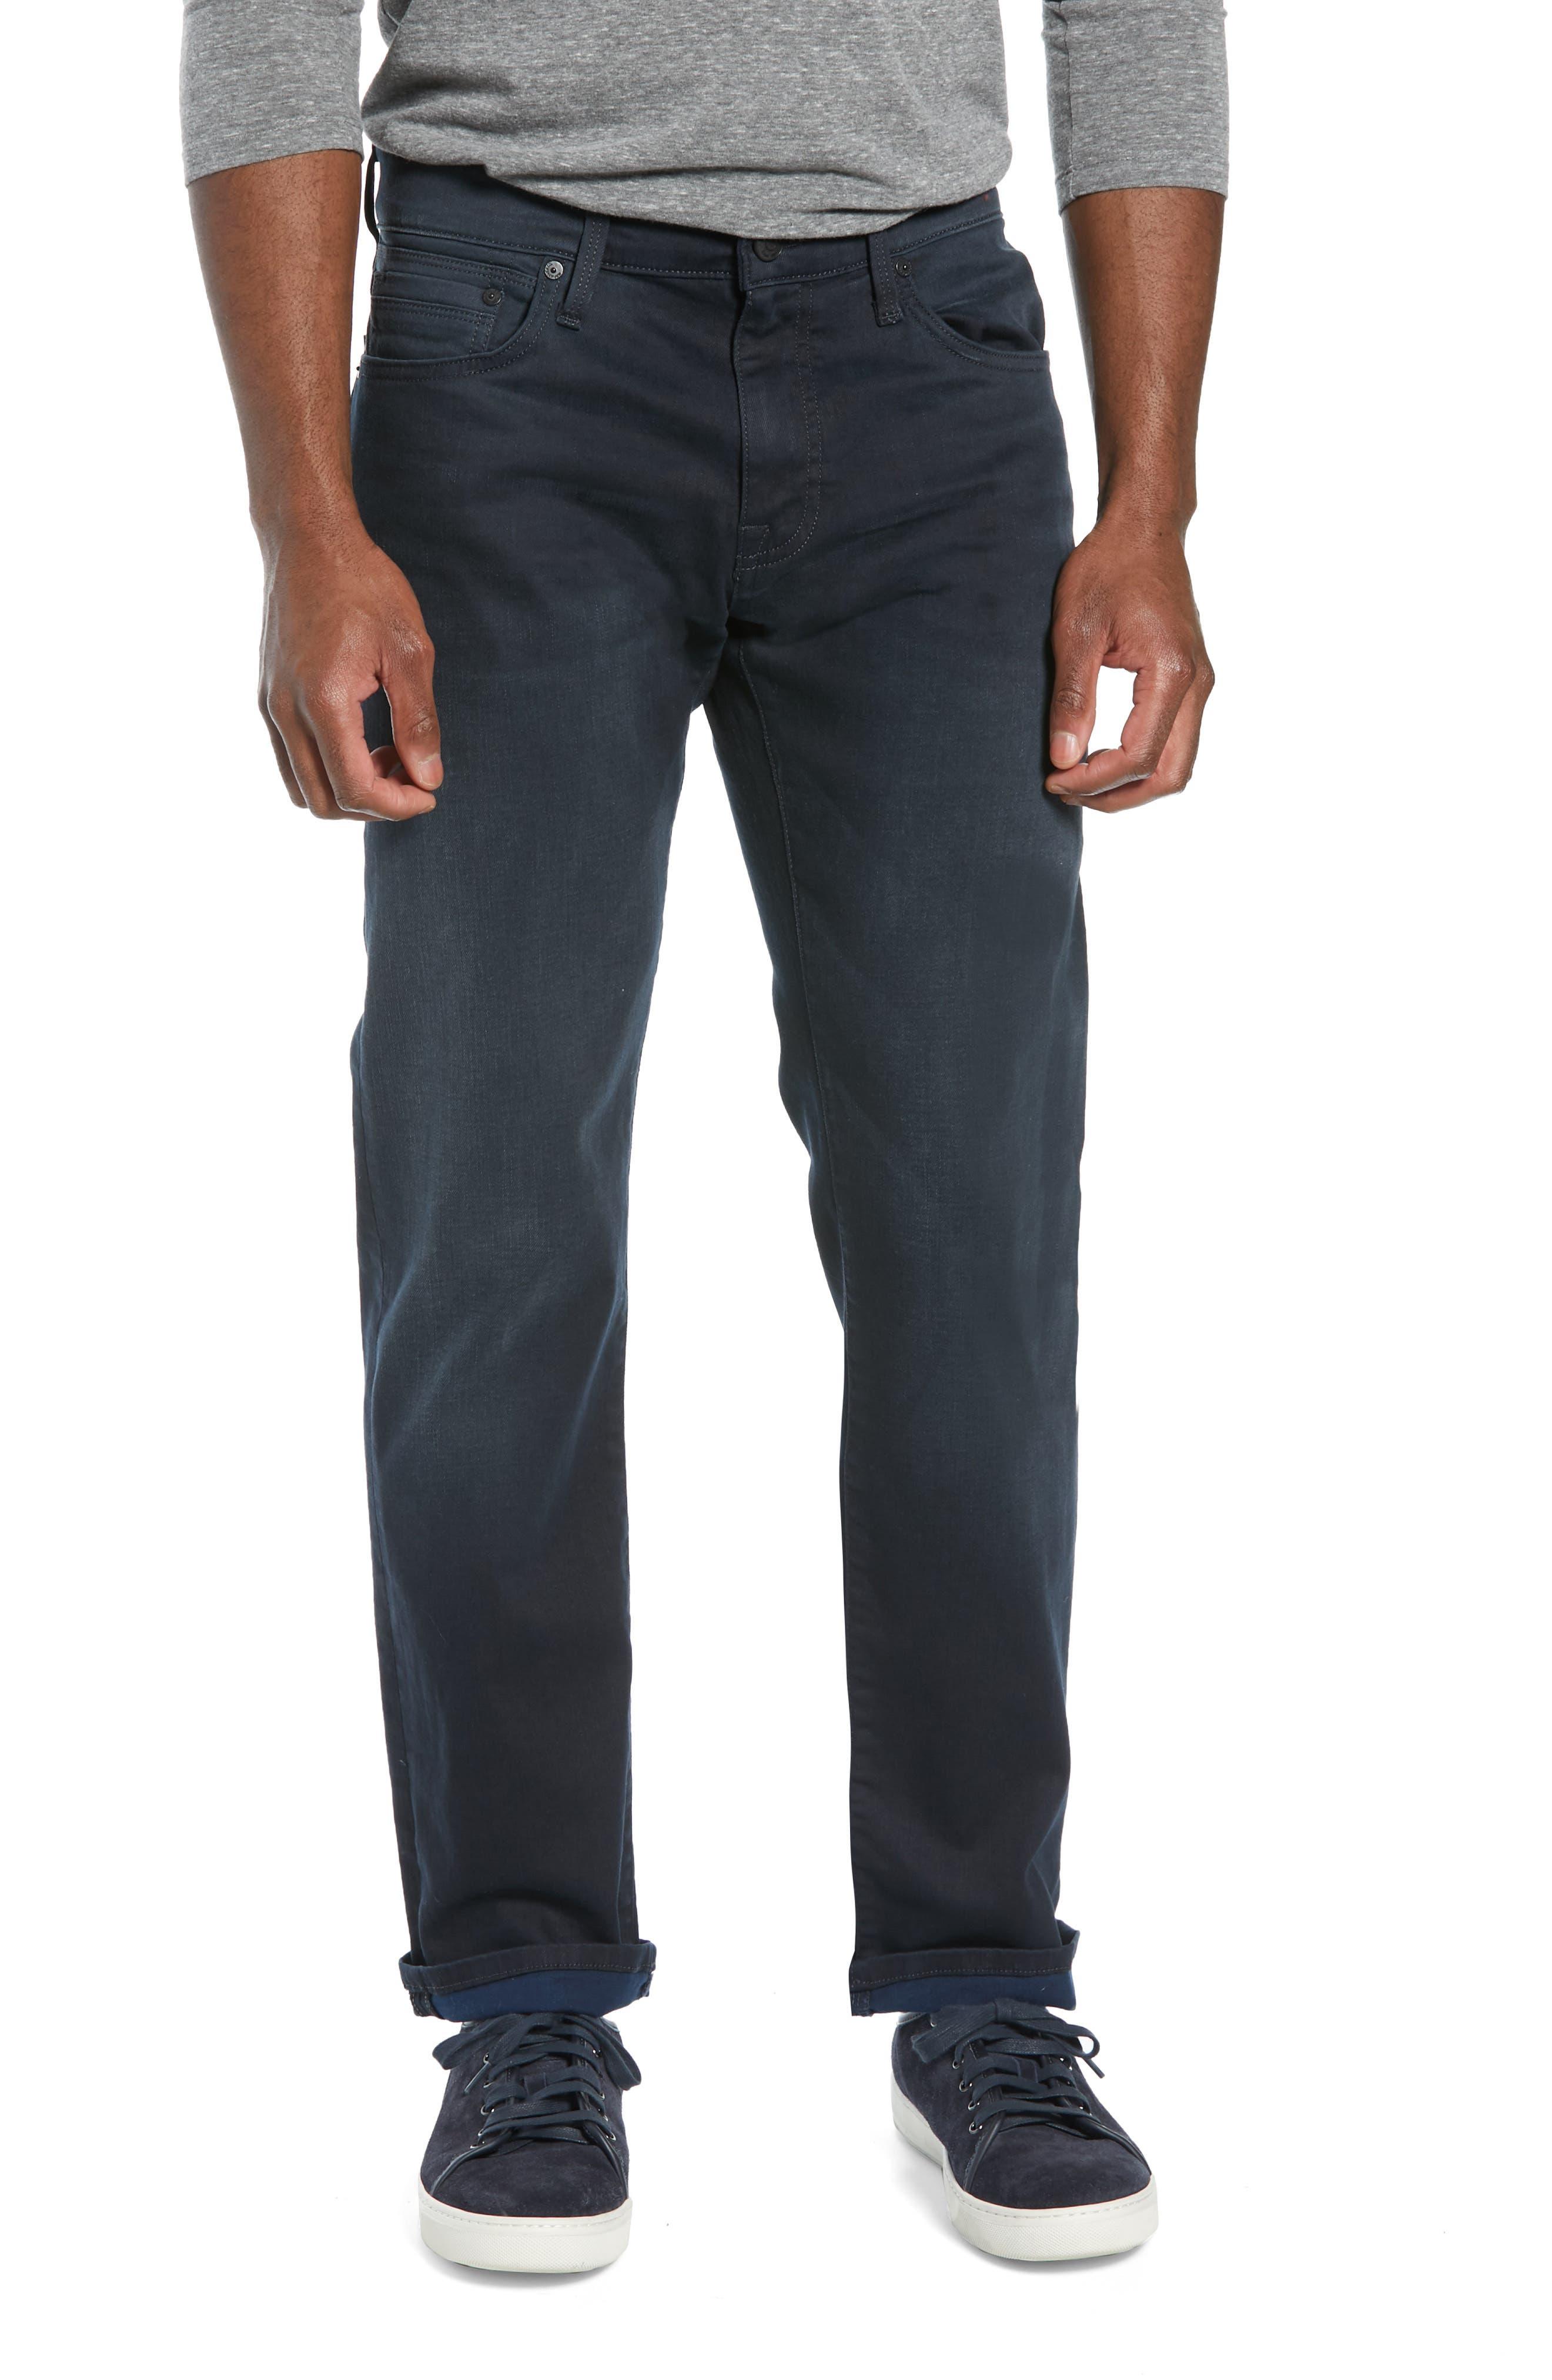 MAVI JEANS Zach Straight Leg Jeans in Blue Black Reversed